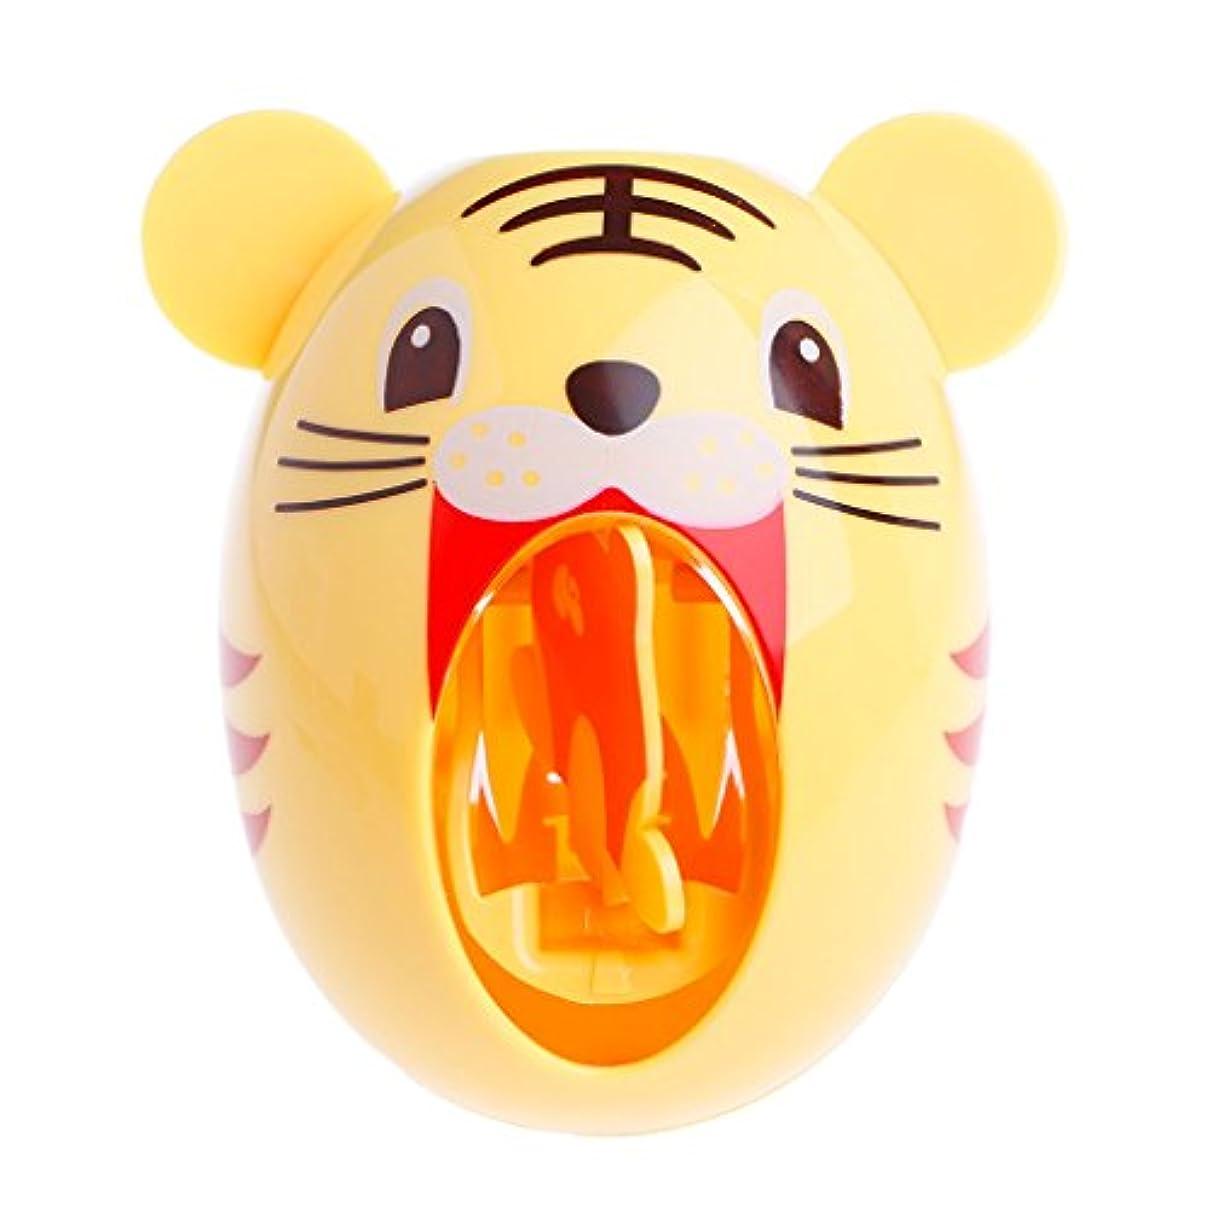 Lamdooキッズかわいい漫画の動物デザイン歯ブラシホルダー自動歯磨き粉ディスペンス